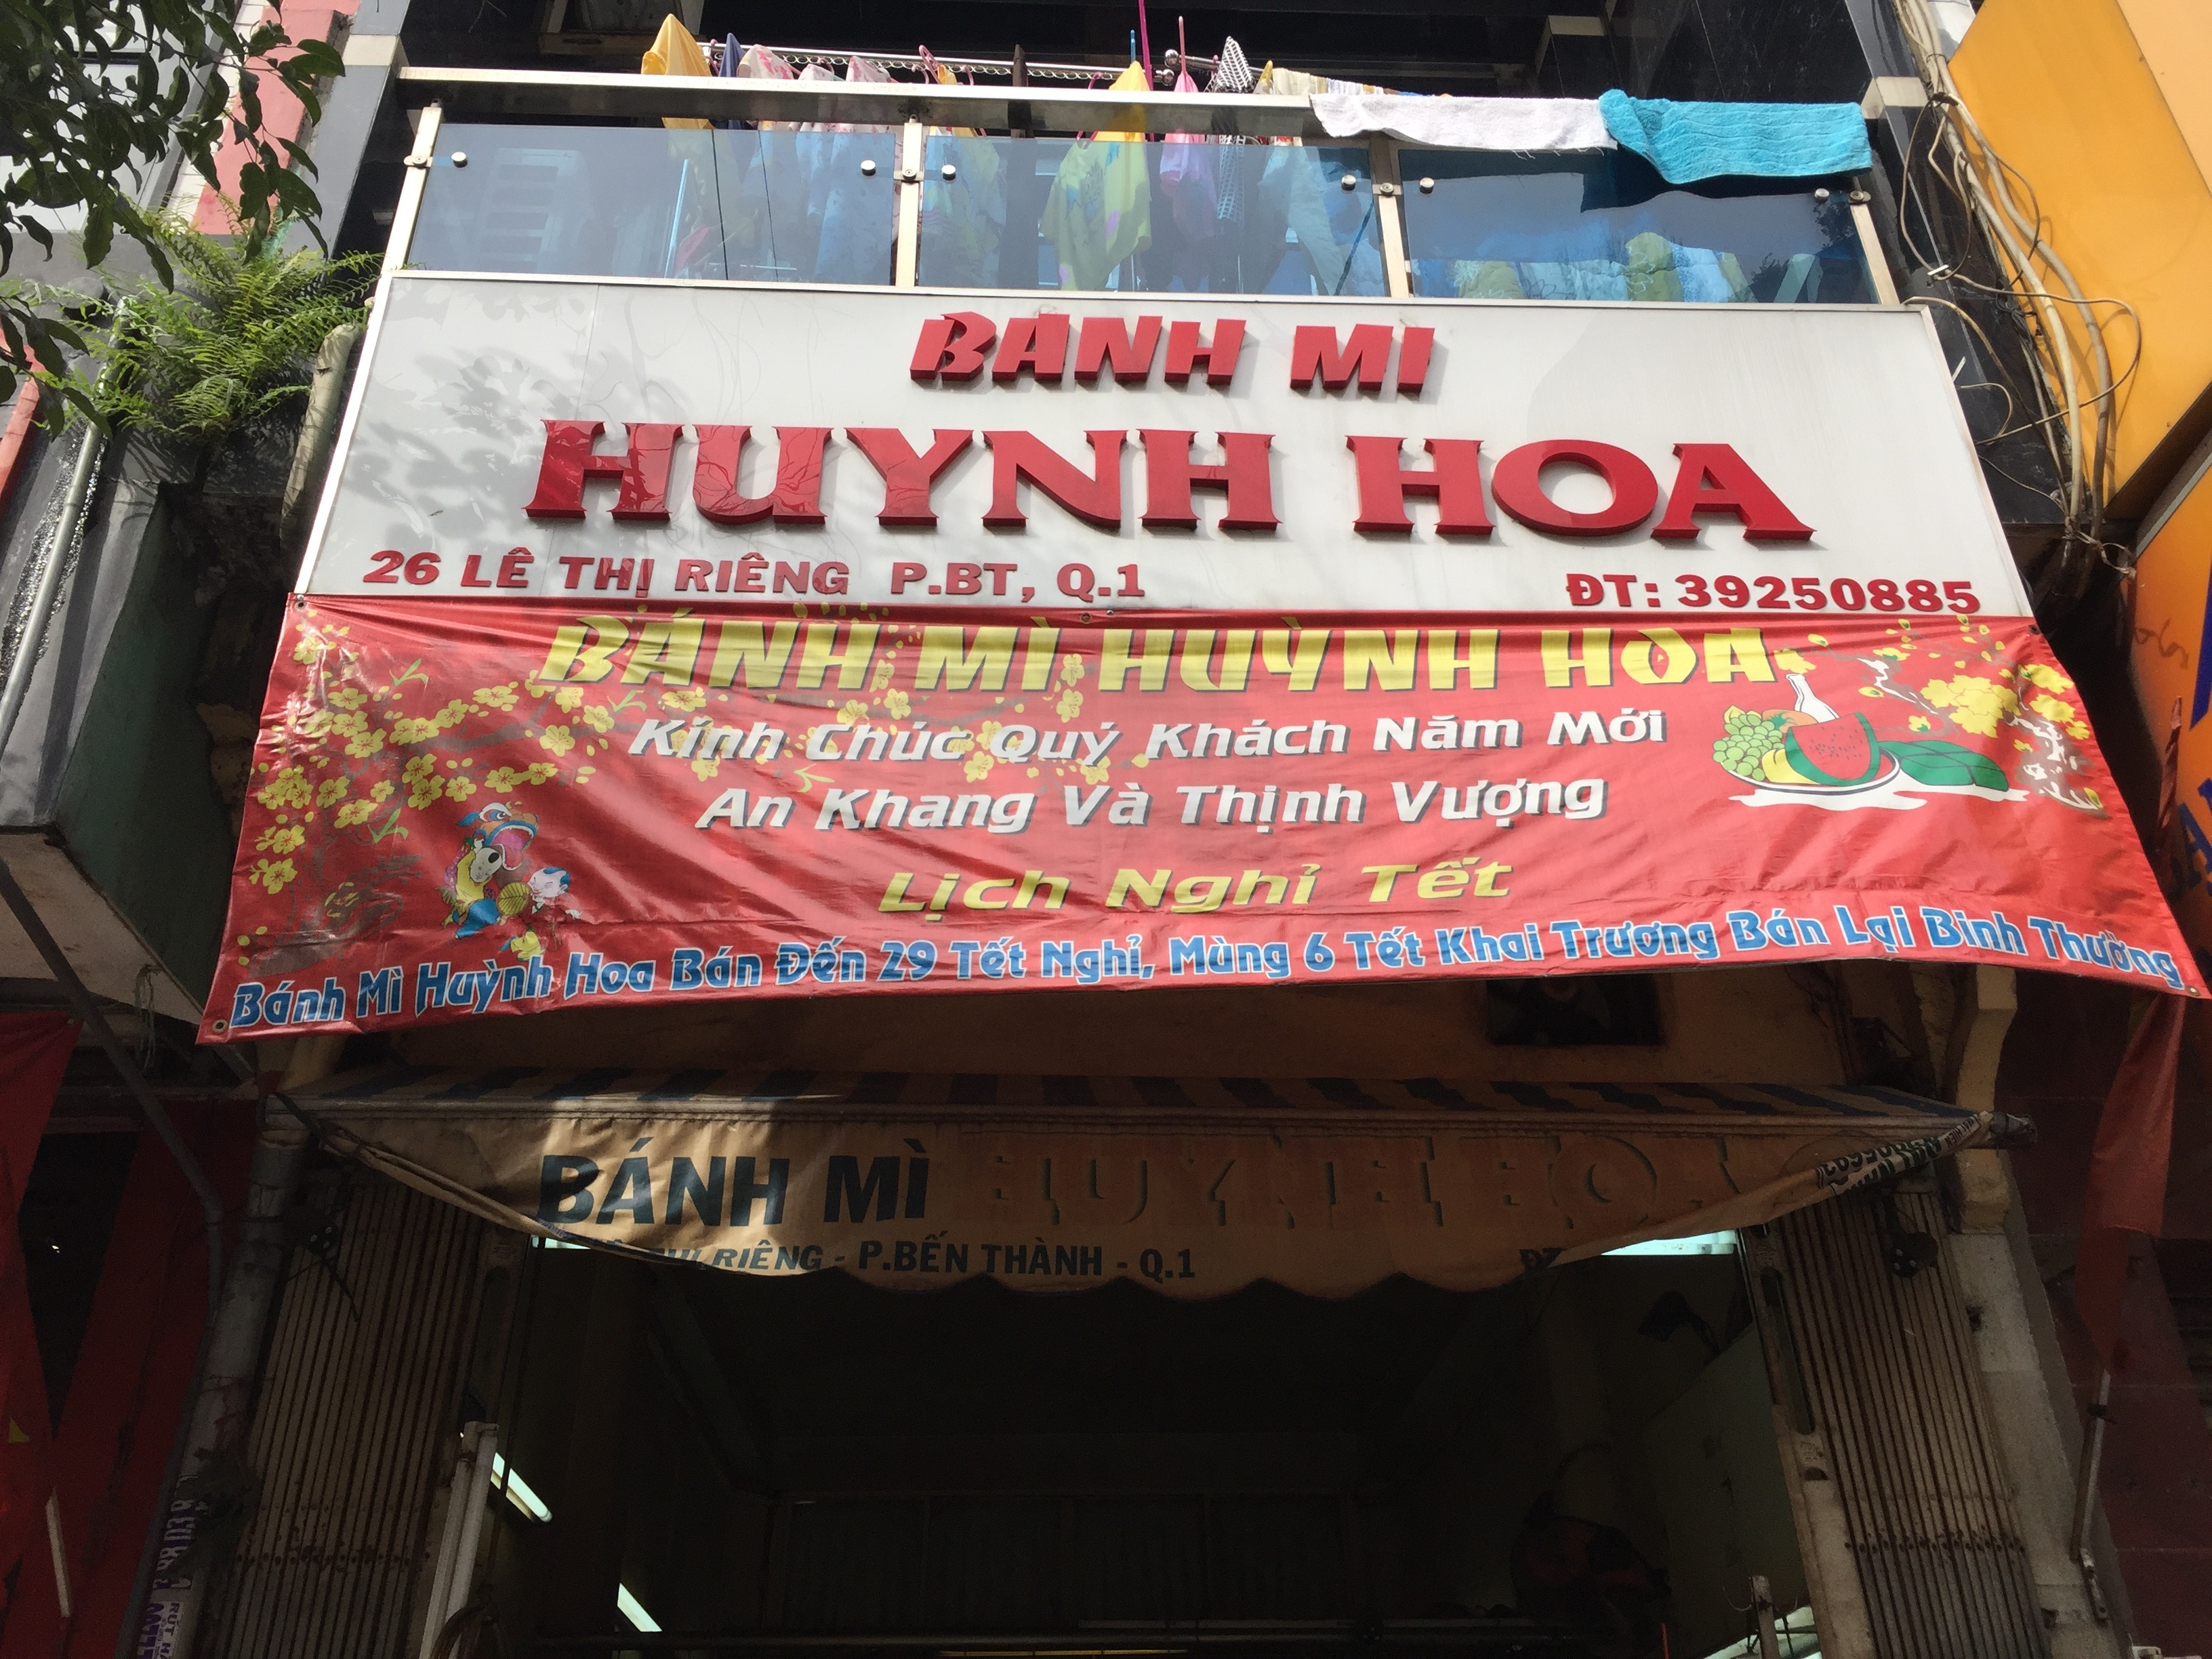 Banh Mi Hyun Hoa